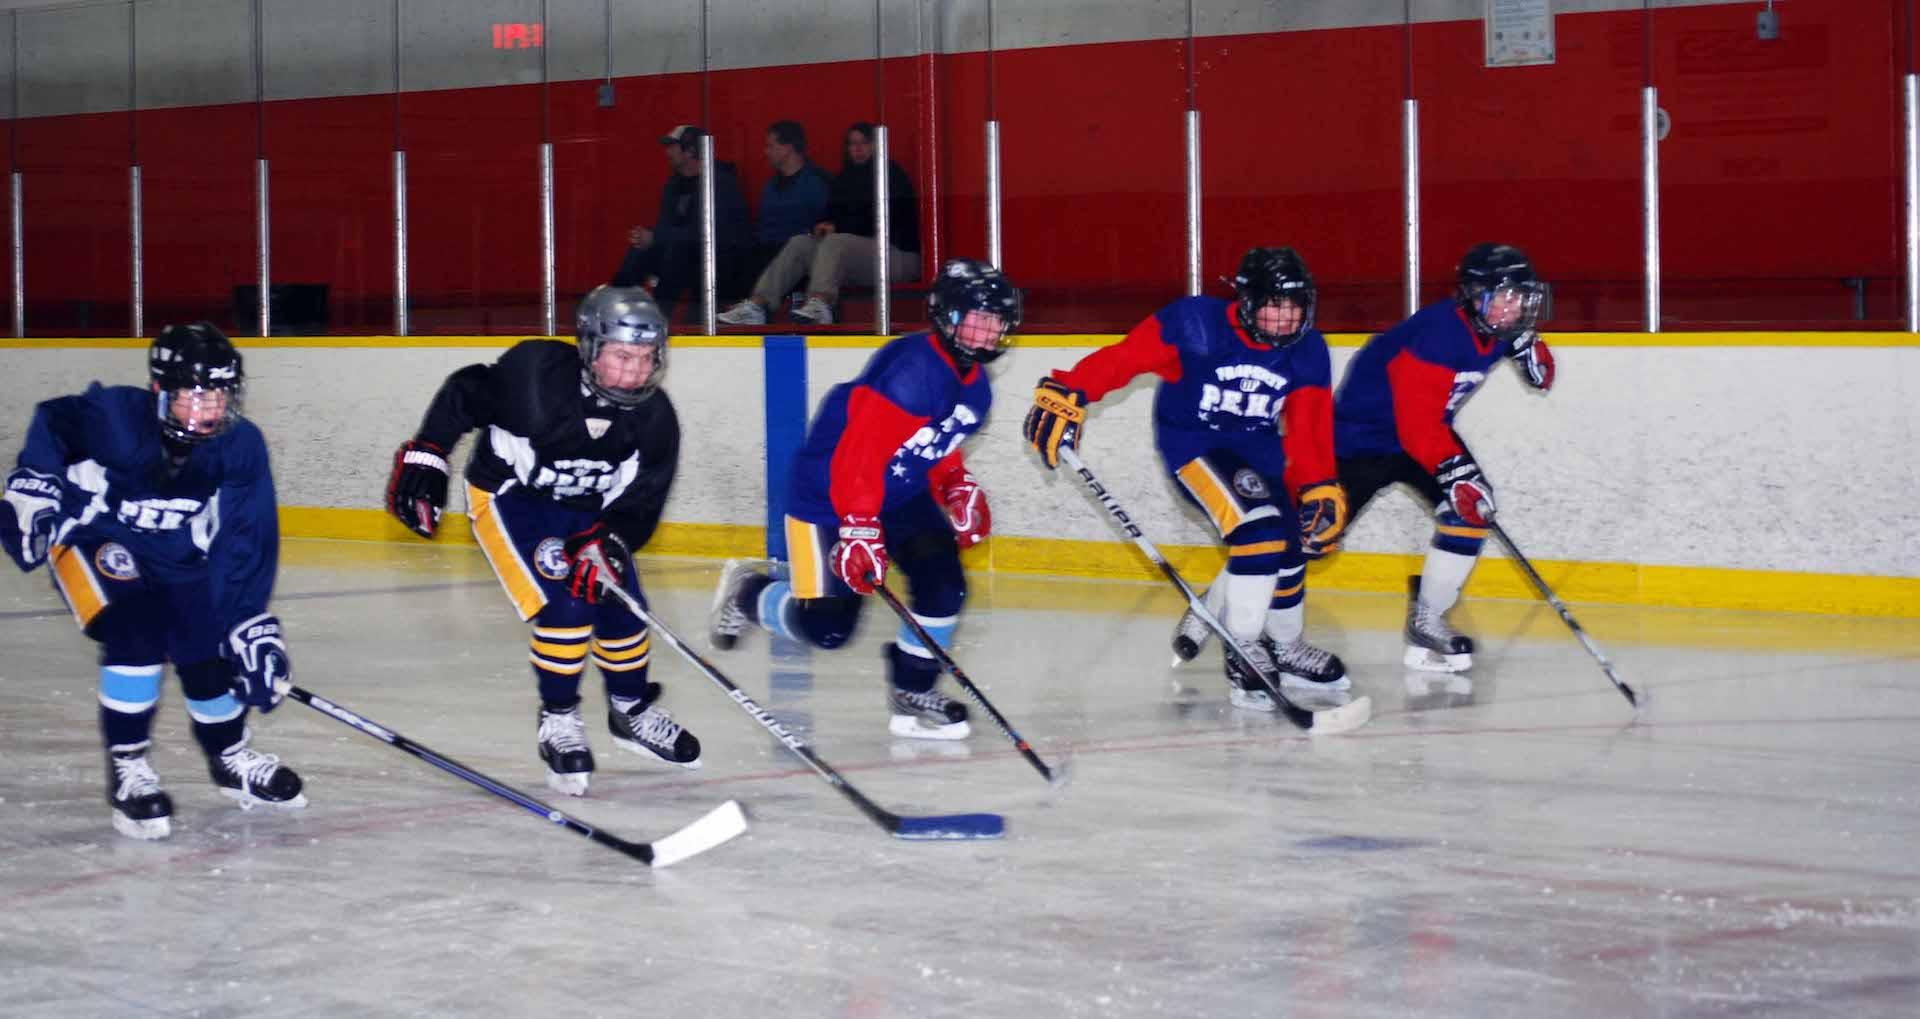 H3 4 Advanced Power Skating And Hockey Development Combo Hockey